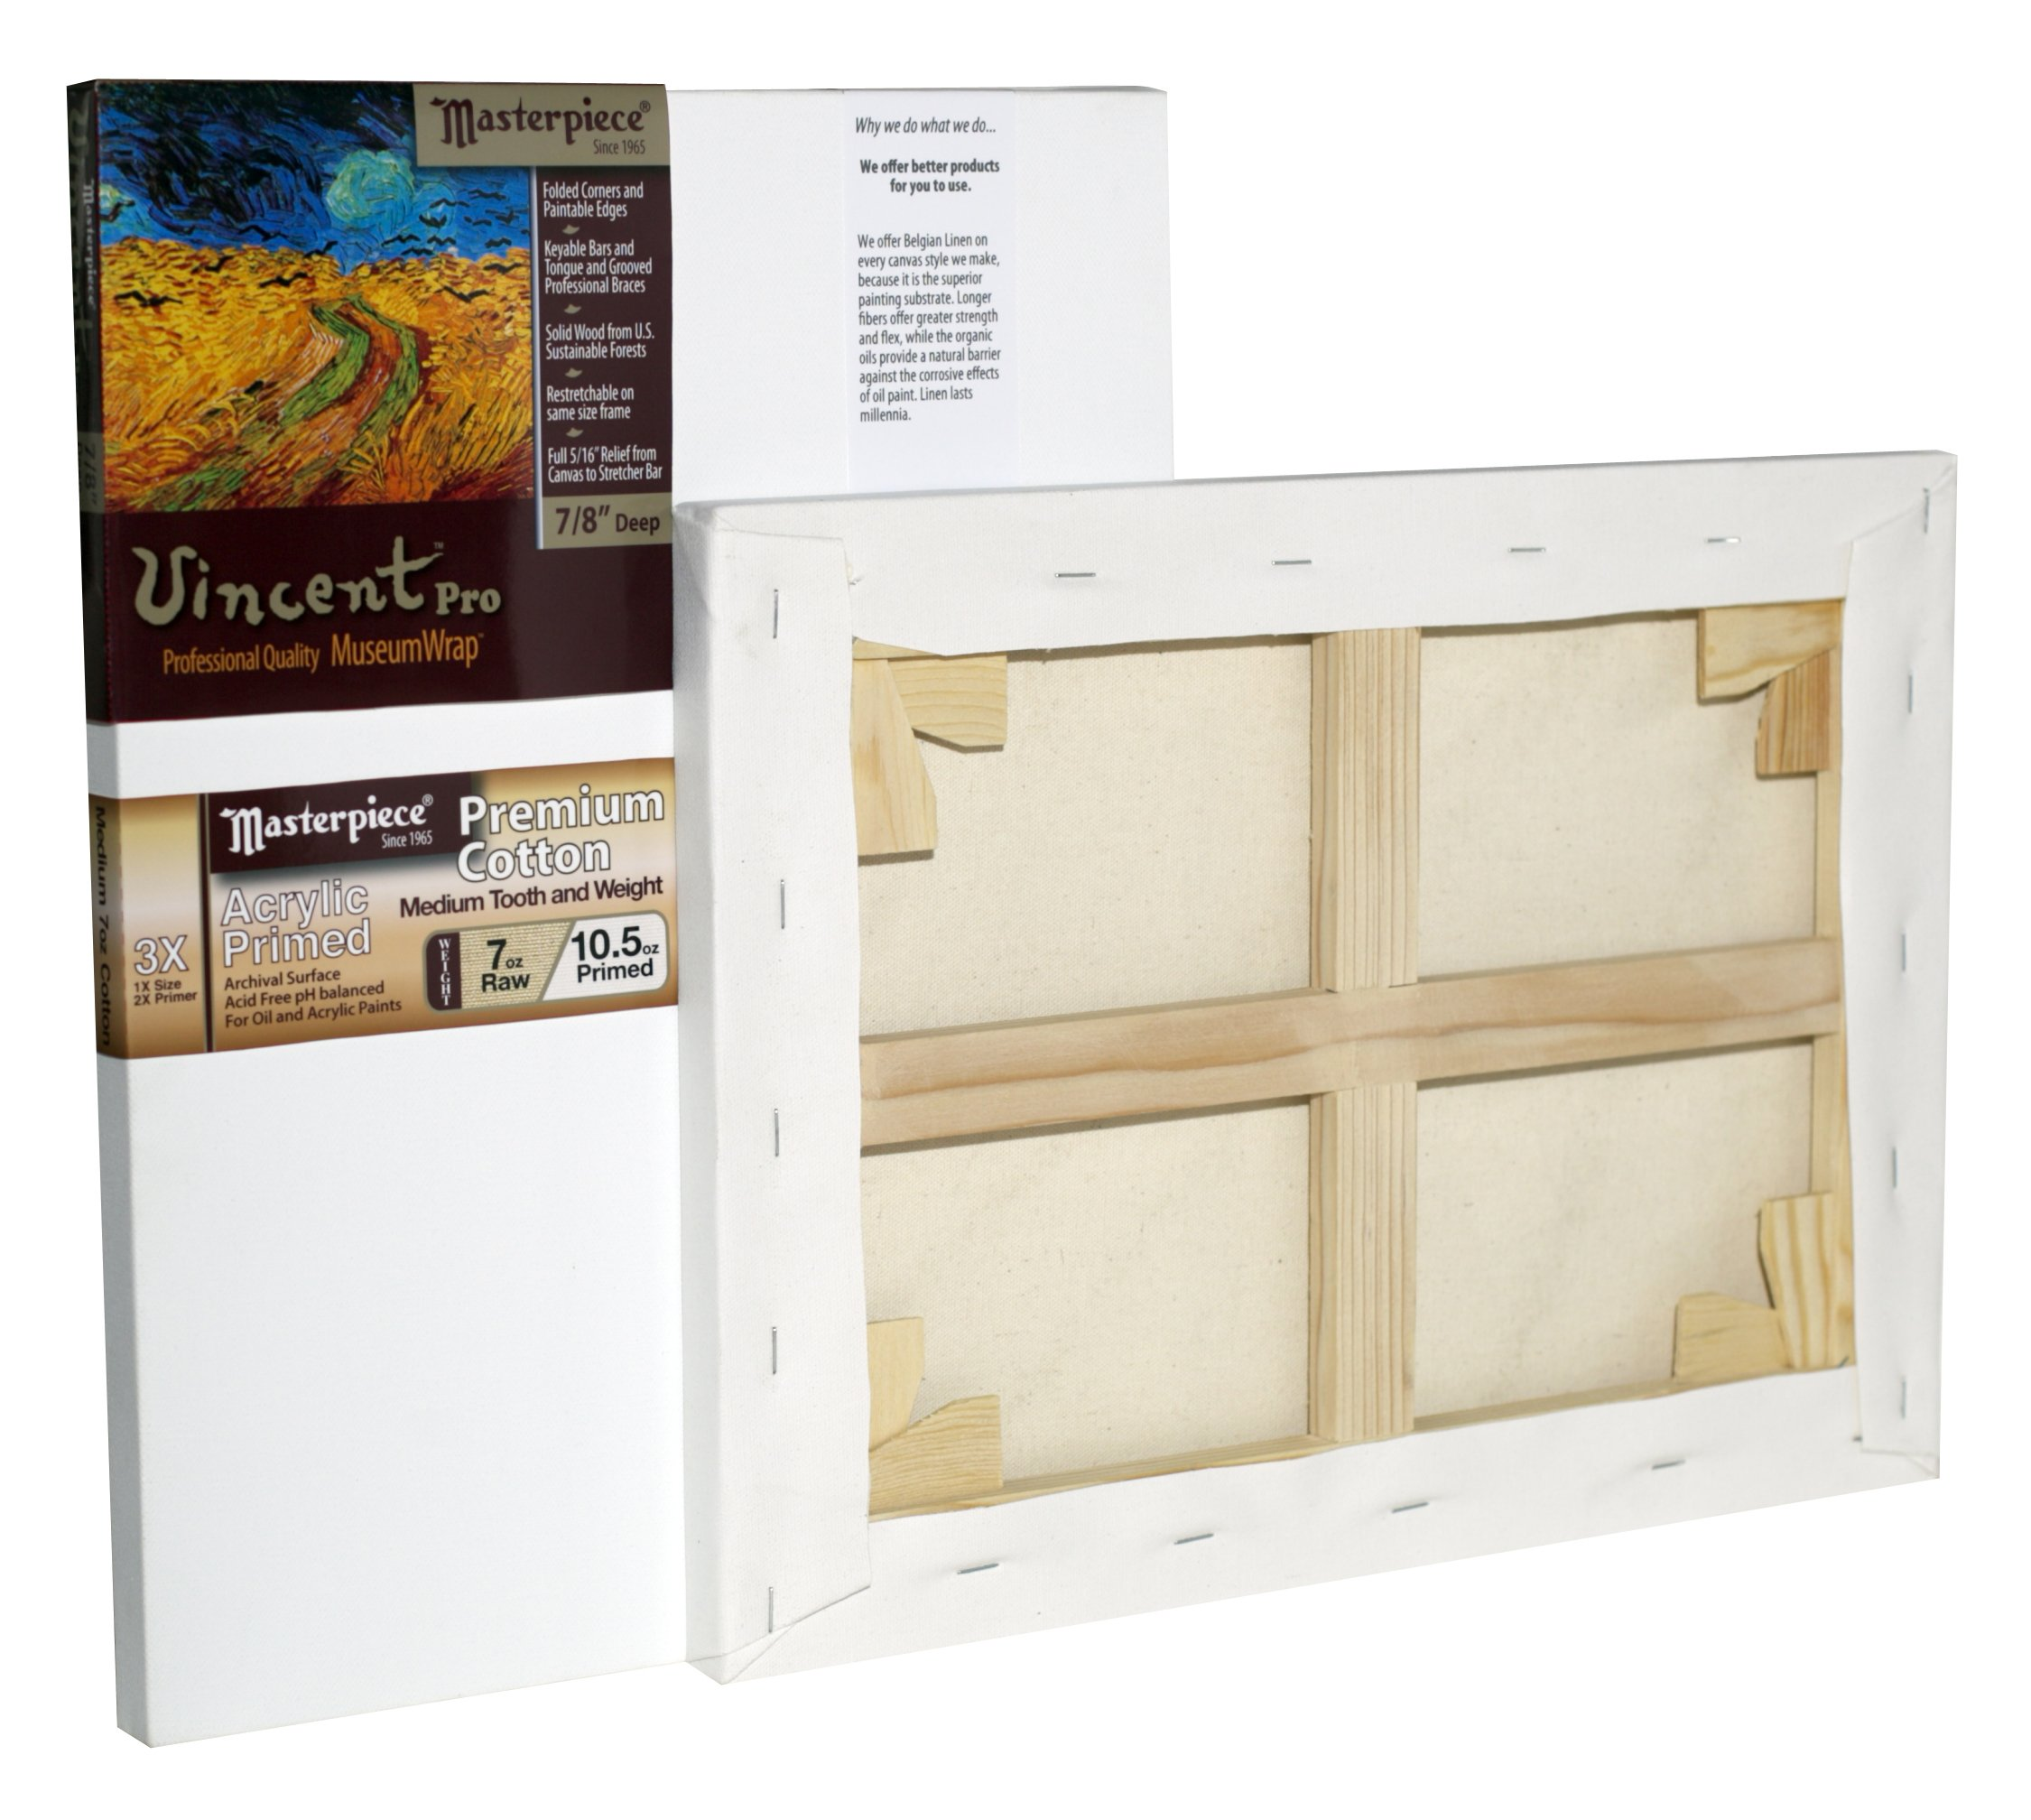 Masterpiece Artist Canvas 41057 Vincent PRO 7/8'' Deep, 24'' x 36'', Cotton 10.5oz - 3X - Monterey Most Popular by Masterpiece Artist Canvas